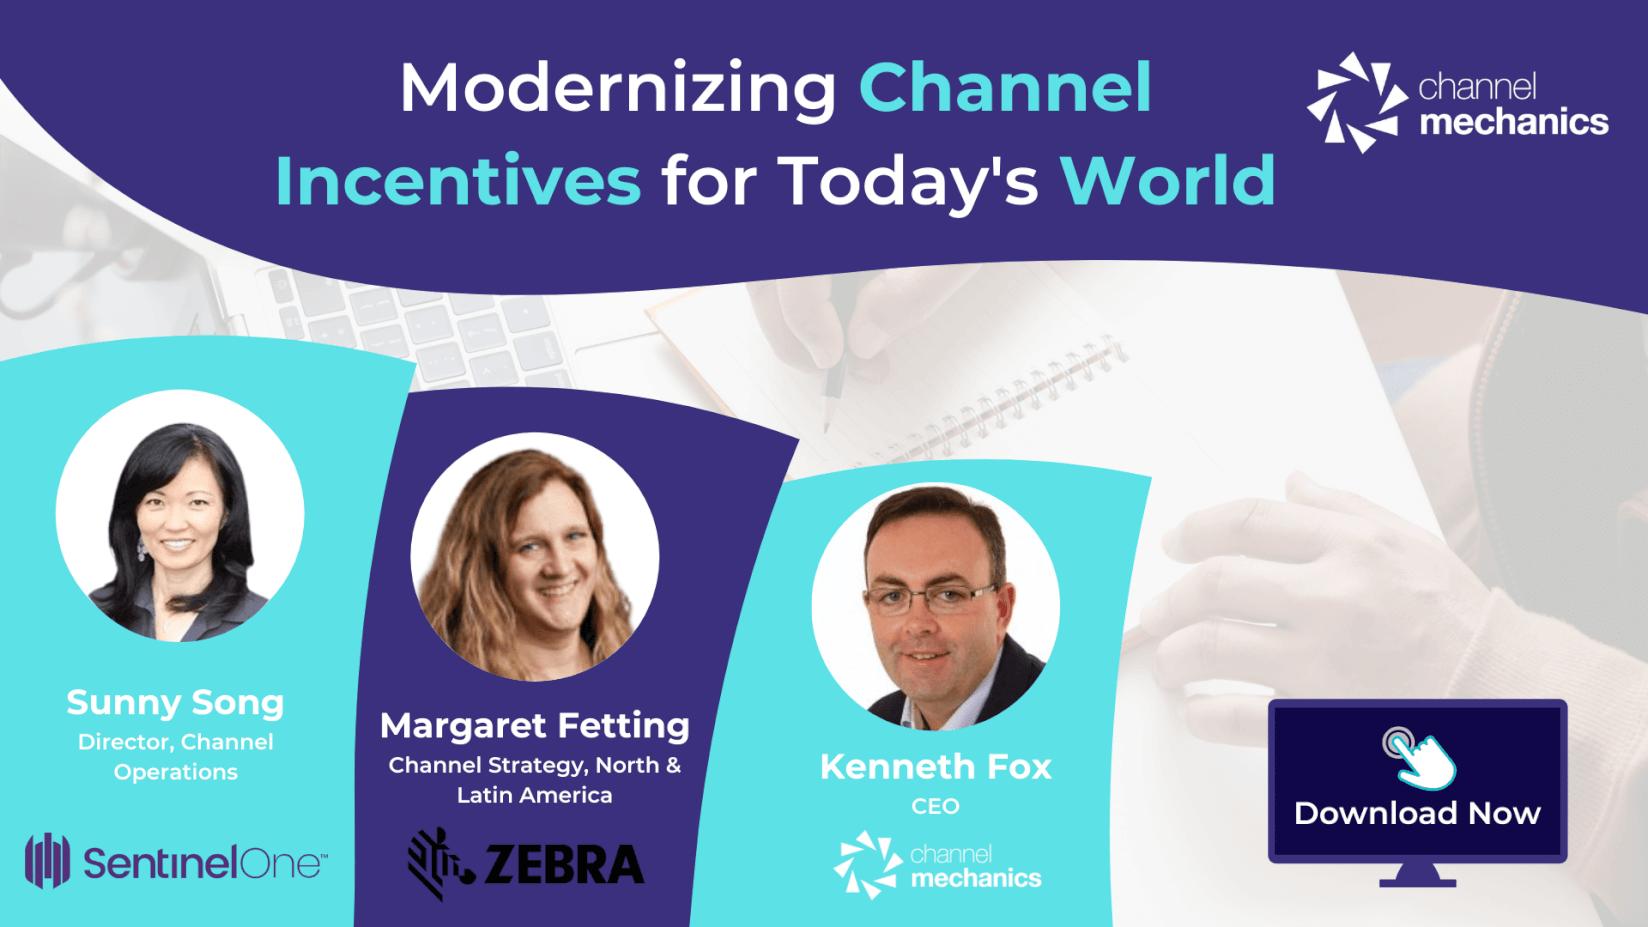 Modernizing Channel Incentives